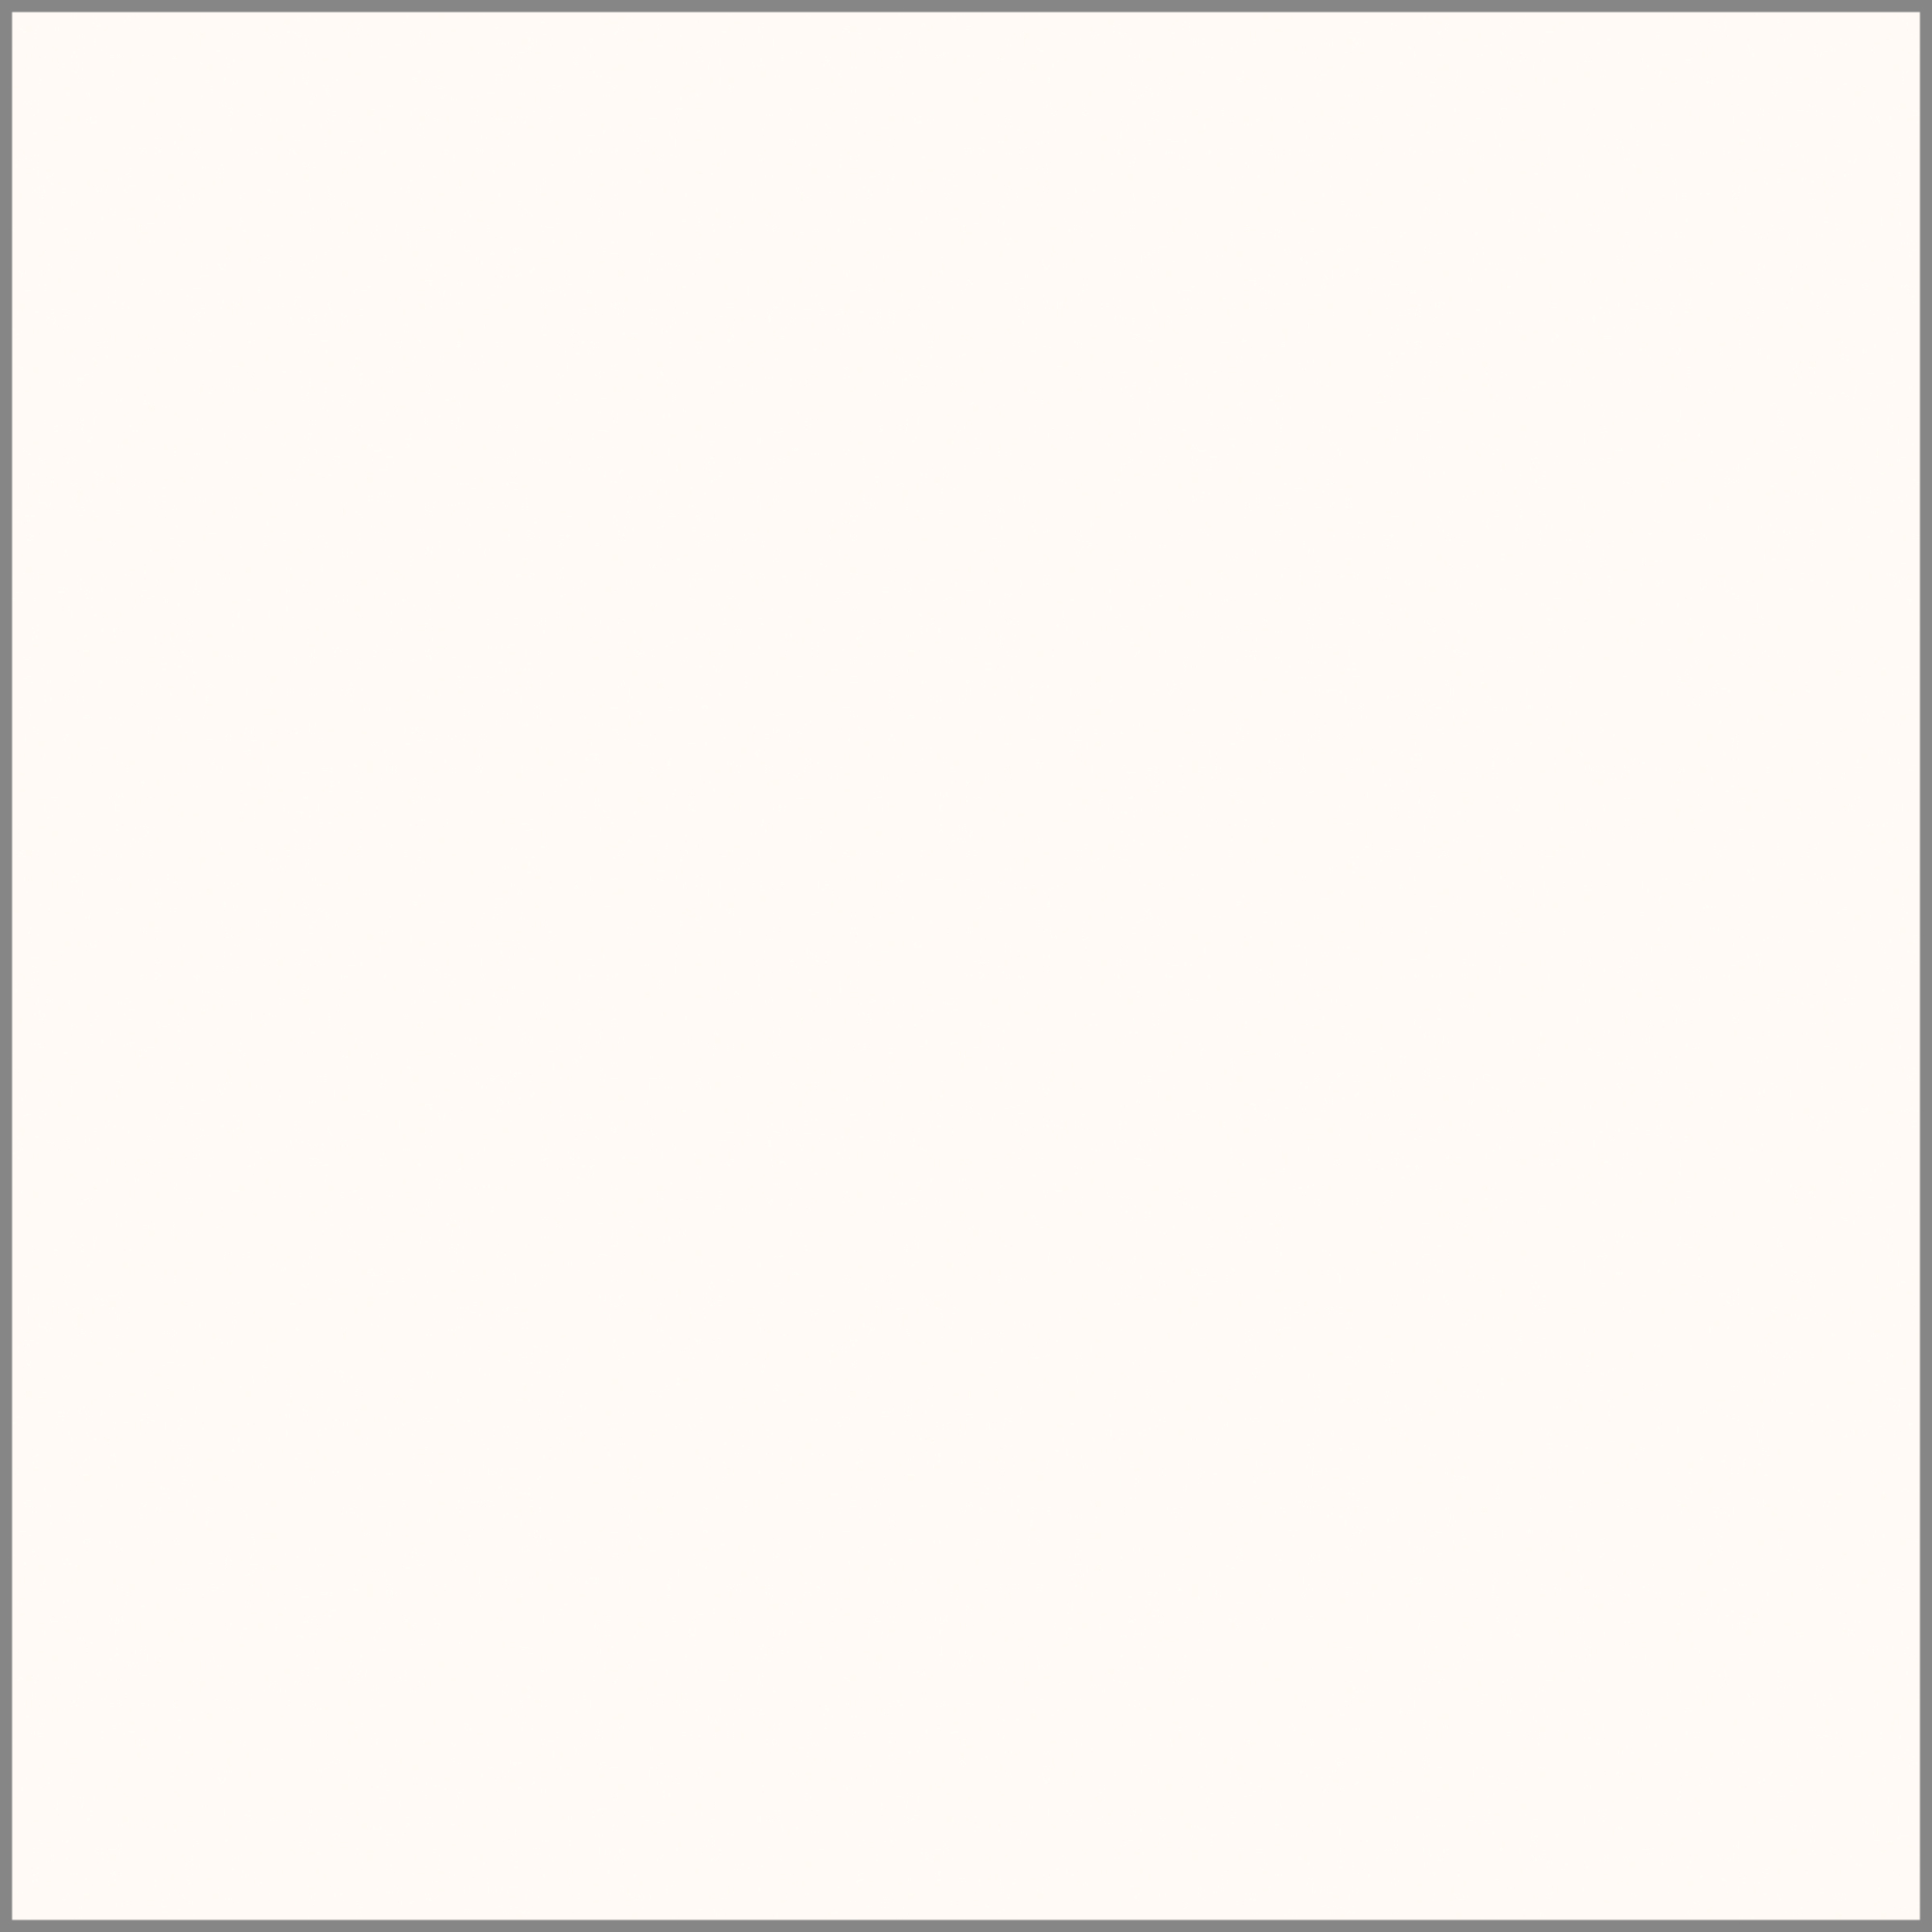 Image for Designer White from SmartMoves Adjustable Height Desks Official Website